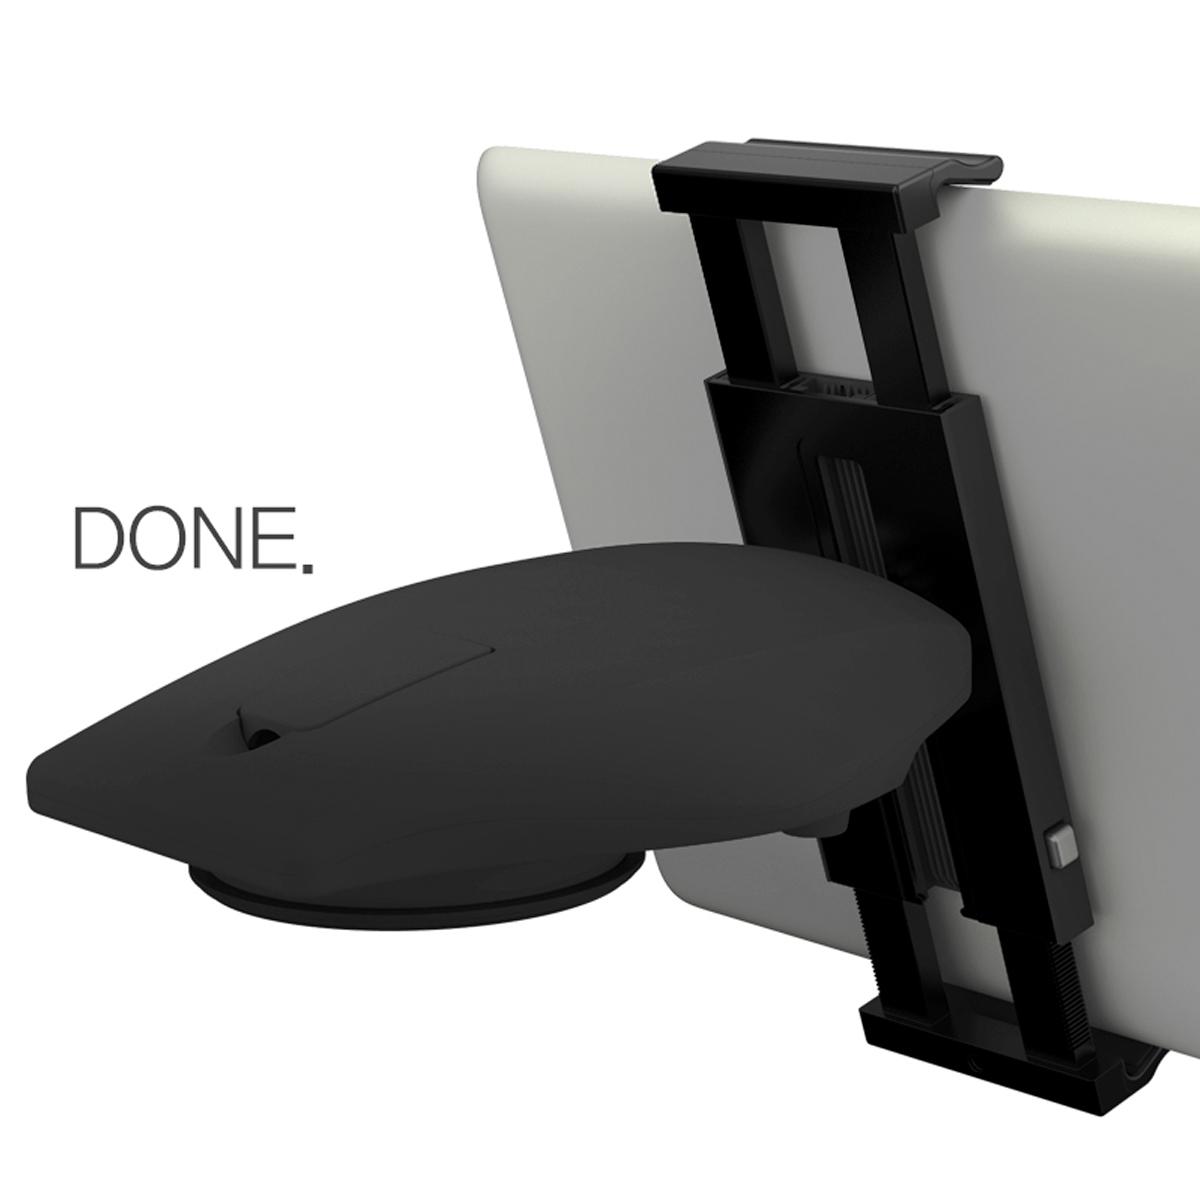 ppyple universal kfz auto armaturenbrett cockpit tablet halter halterung ipad ebay. Black Bedroom Furniture Sets. Home Design Ideas